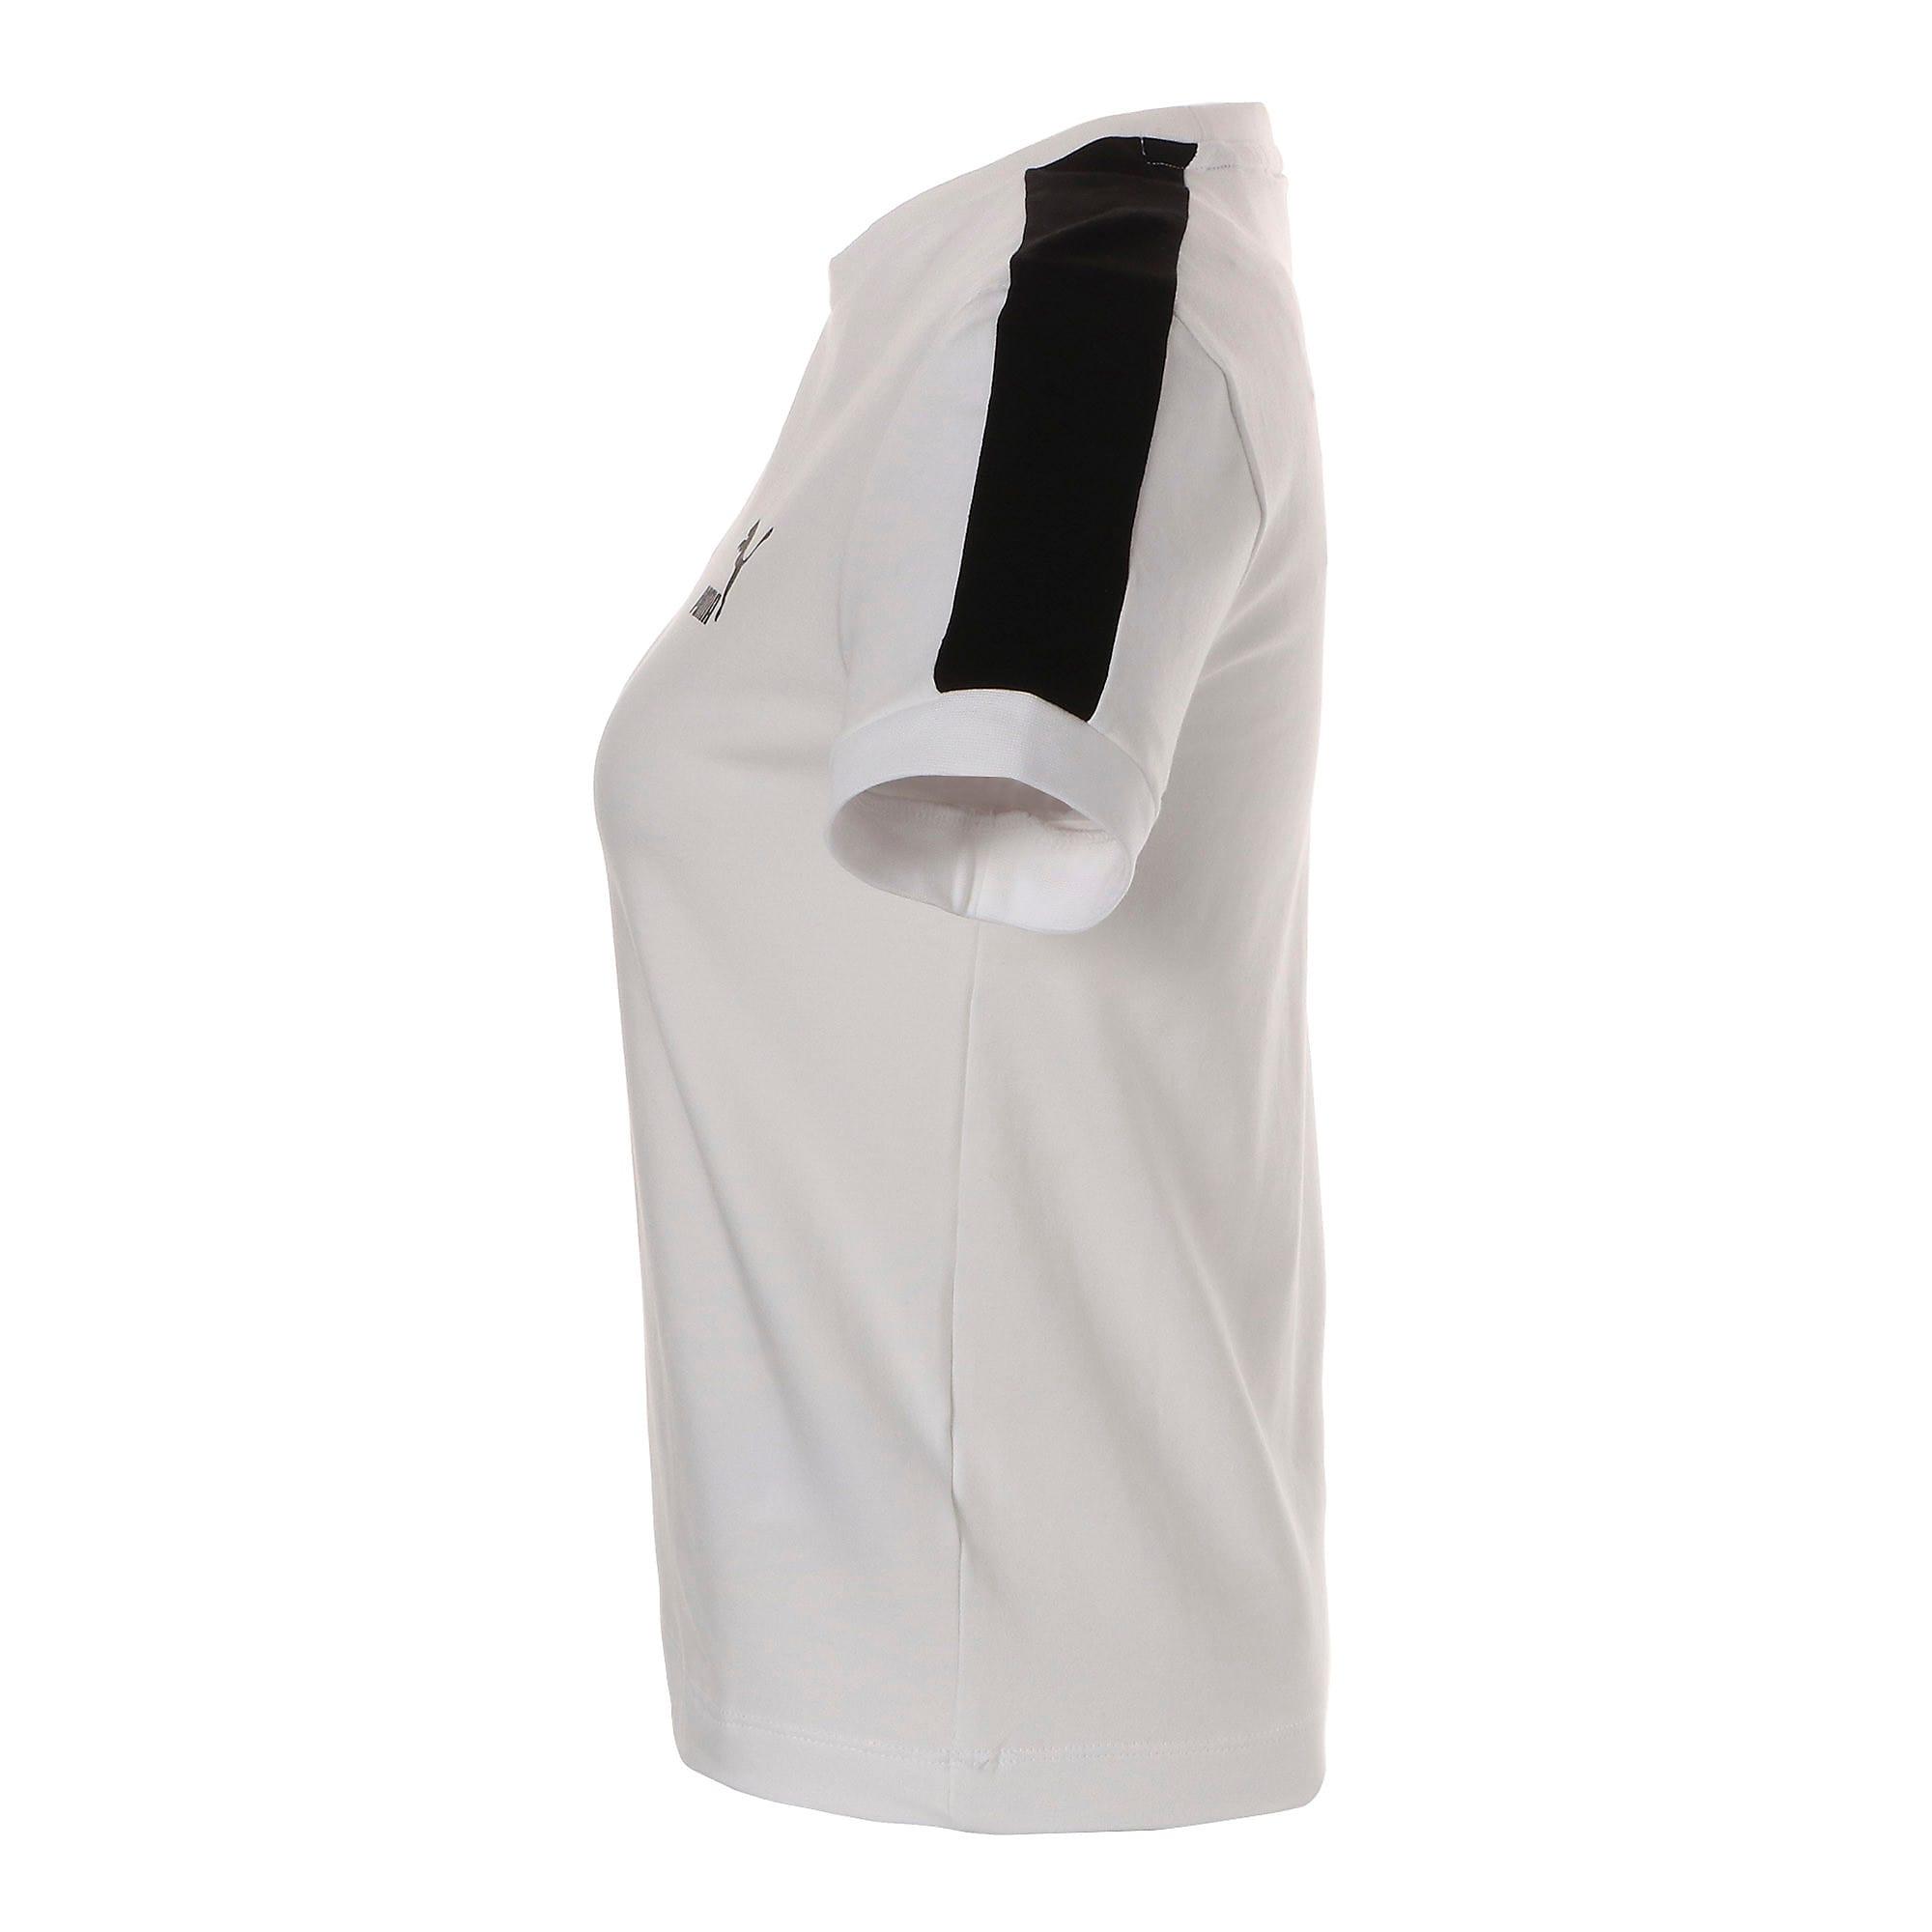 Thumbnail 9 of CLASSICS タイト ウィメンズ SS Tシャツ 半袖, Puma White-black, medium-JPN